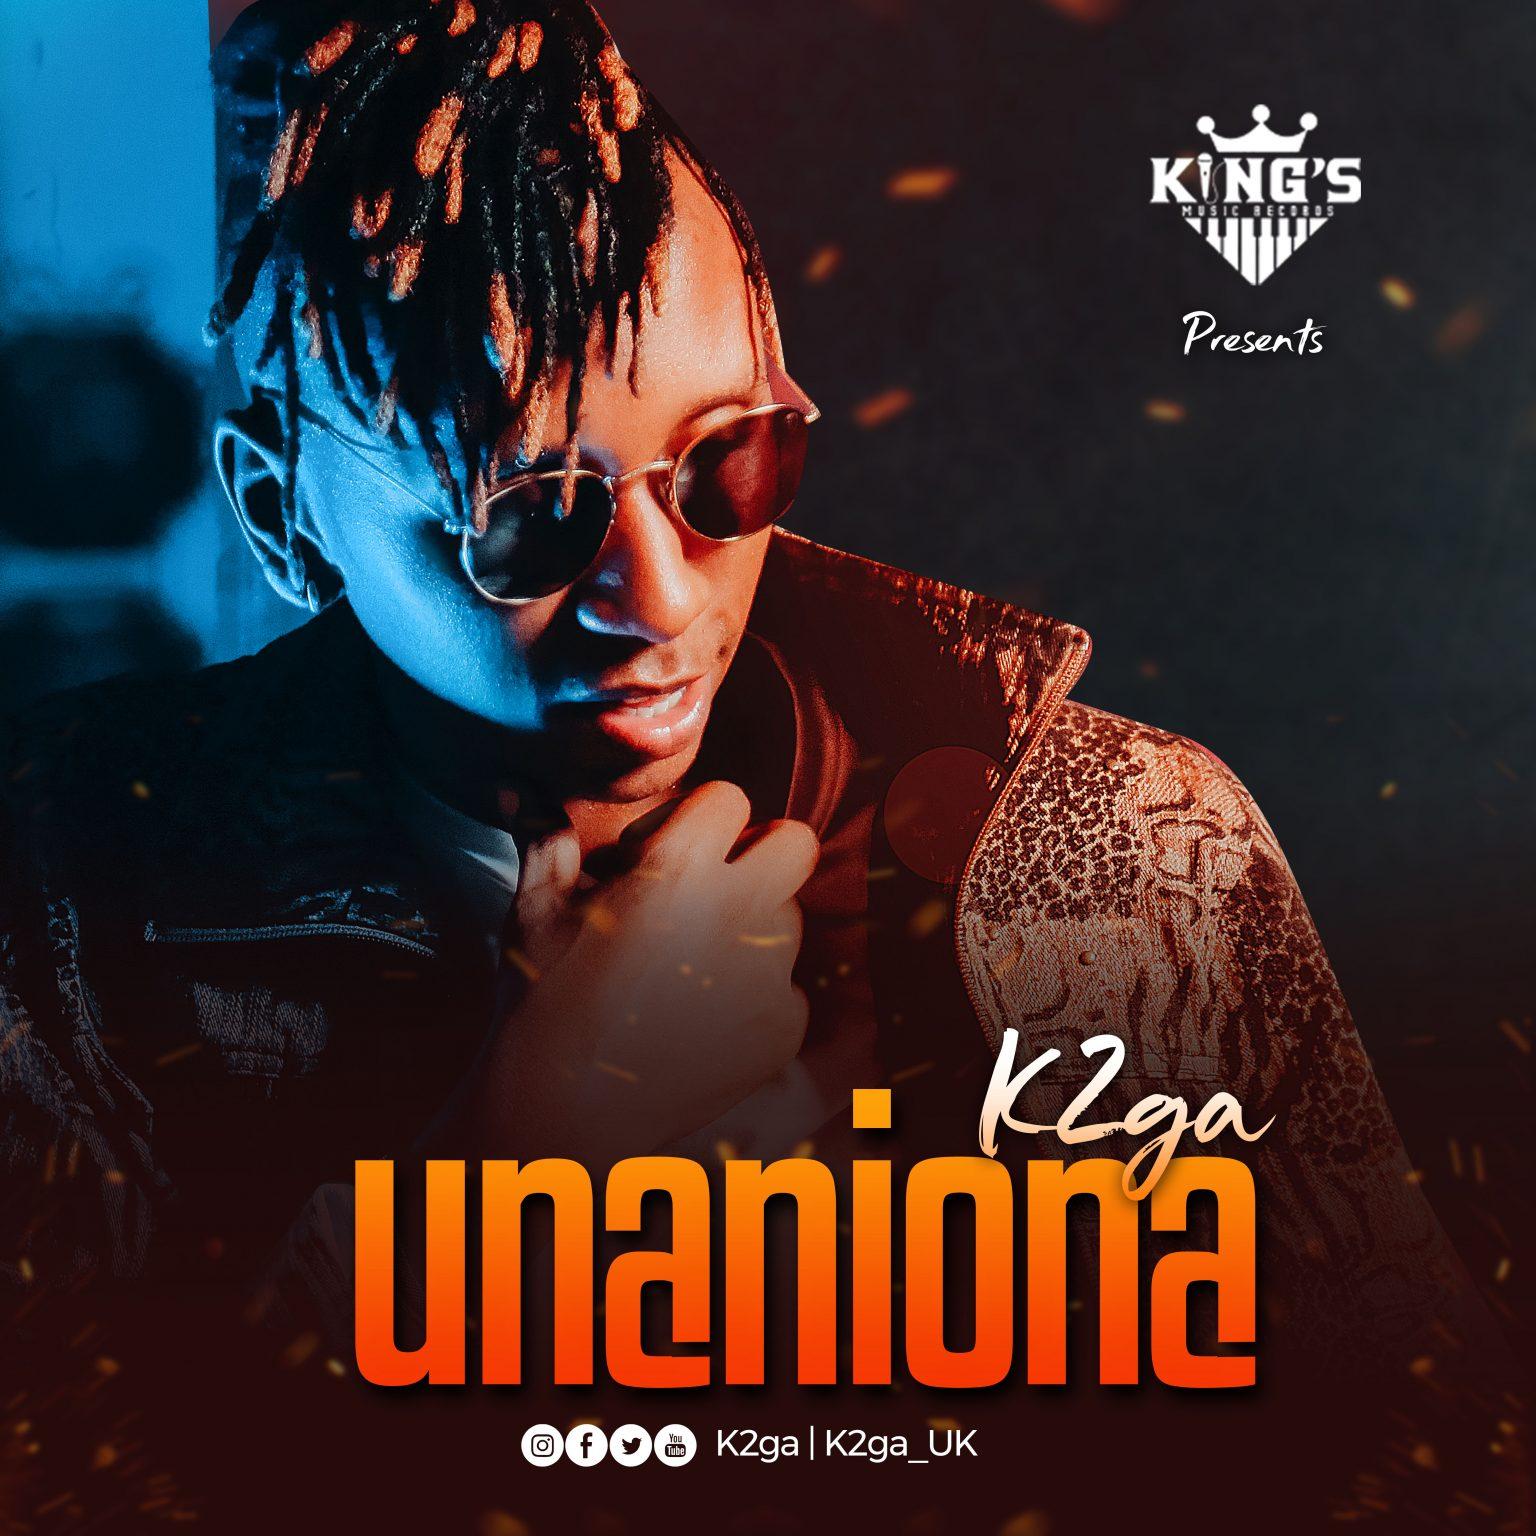 (New Audio) K2ga - UNANIONA Mp3 Download